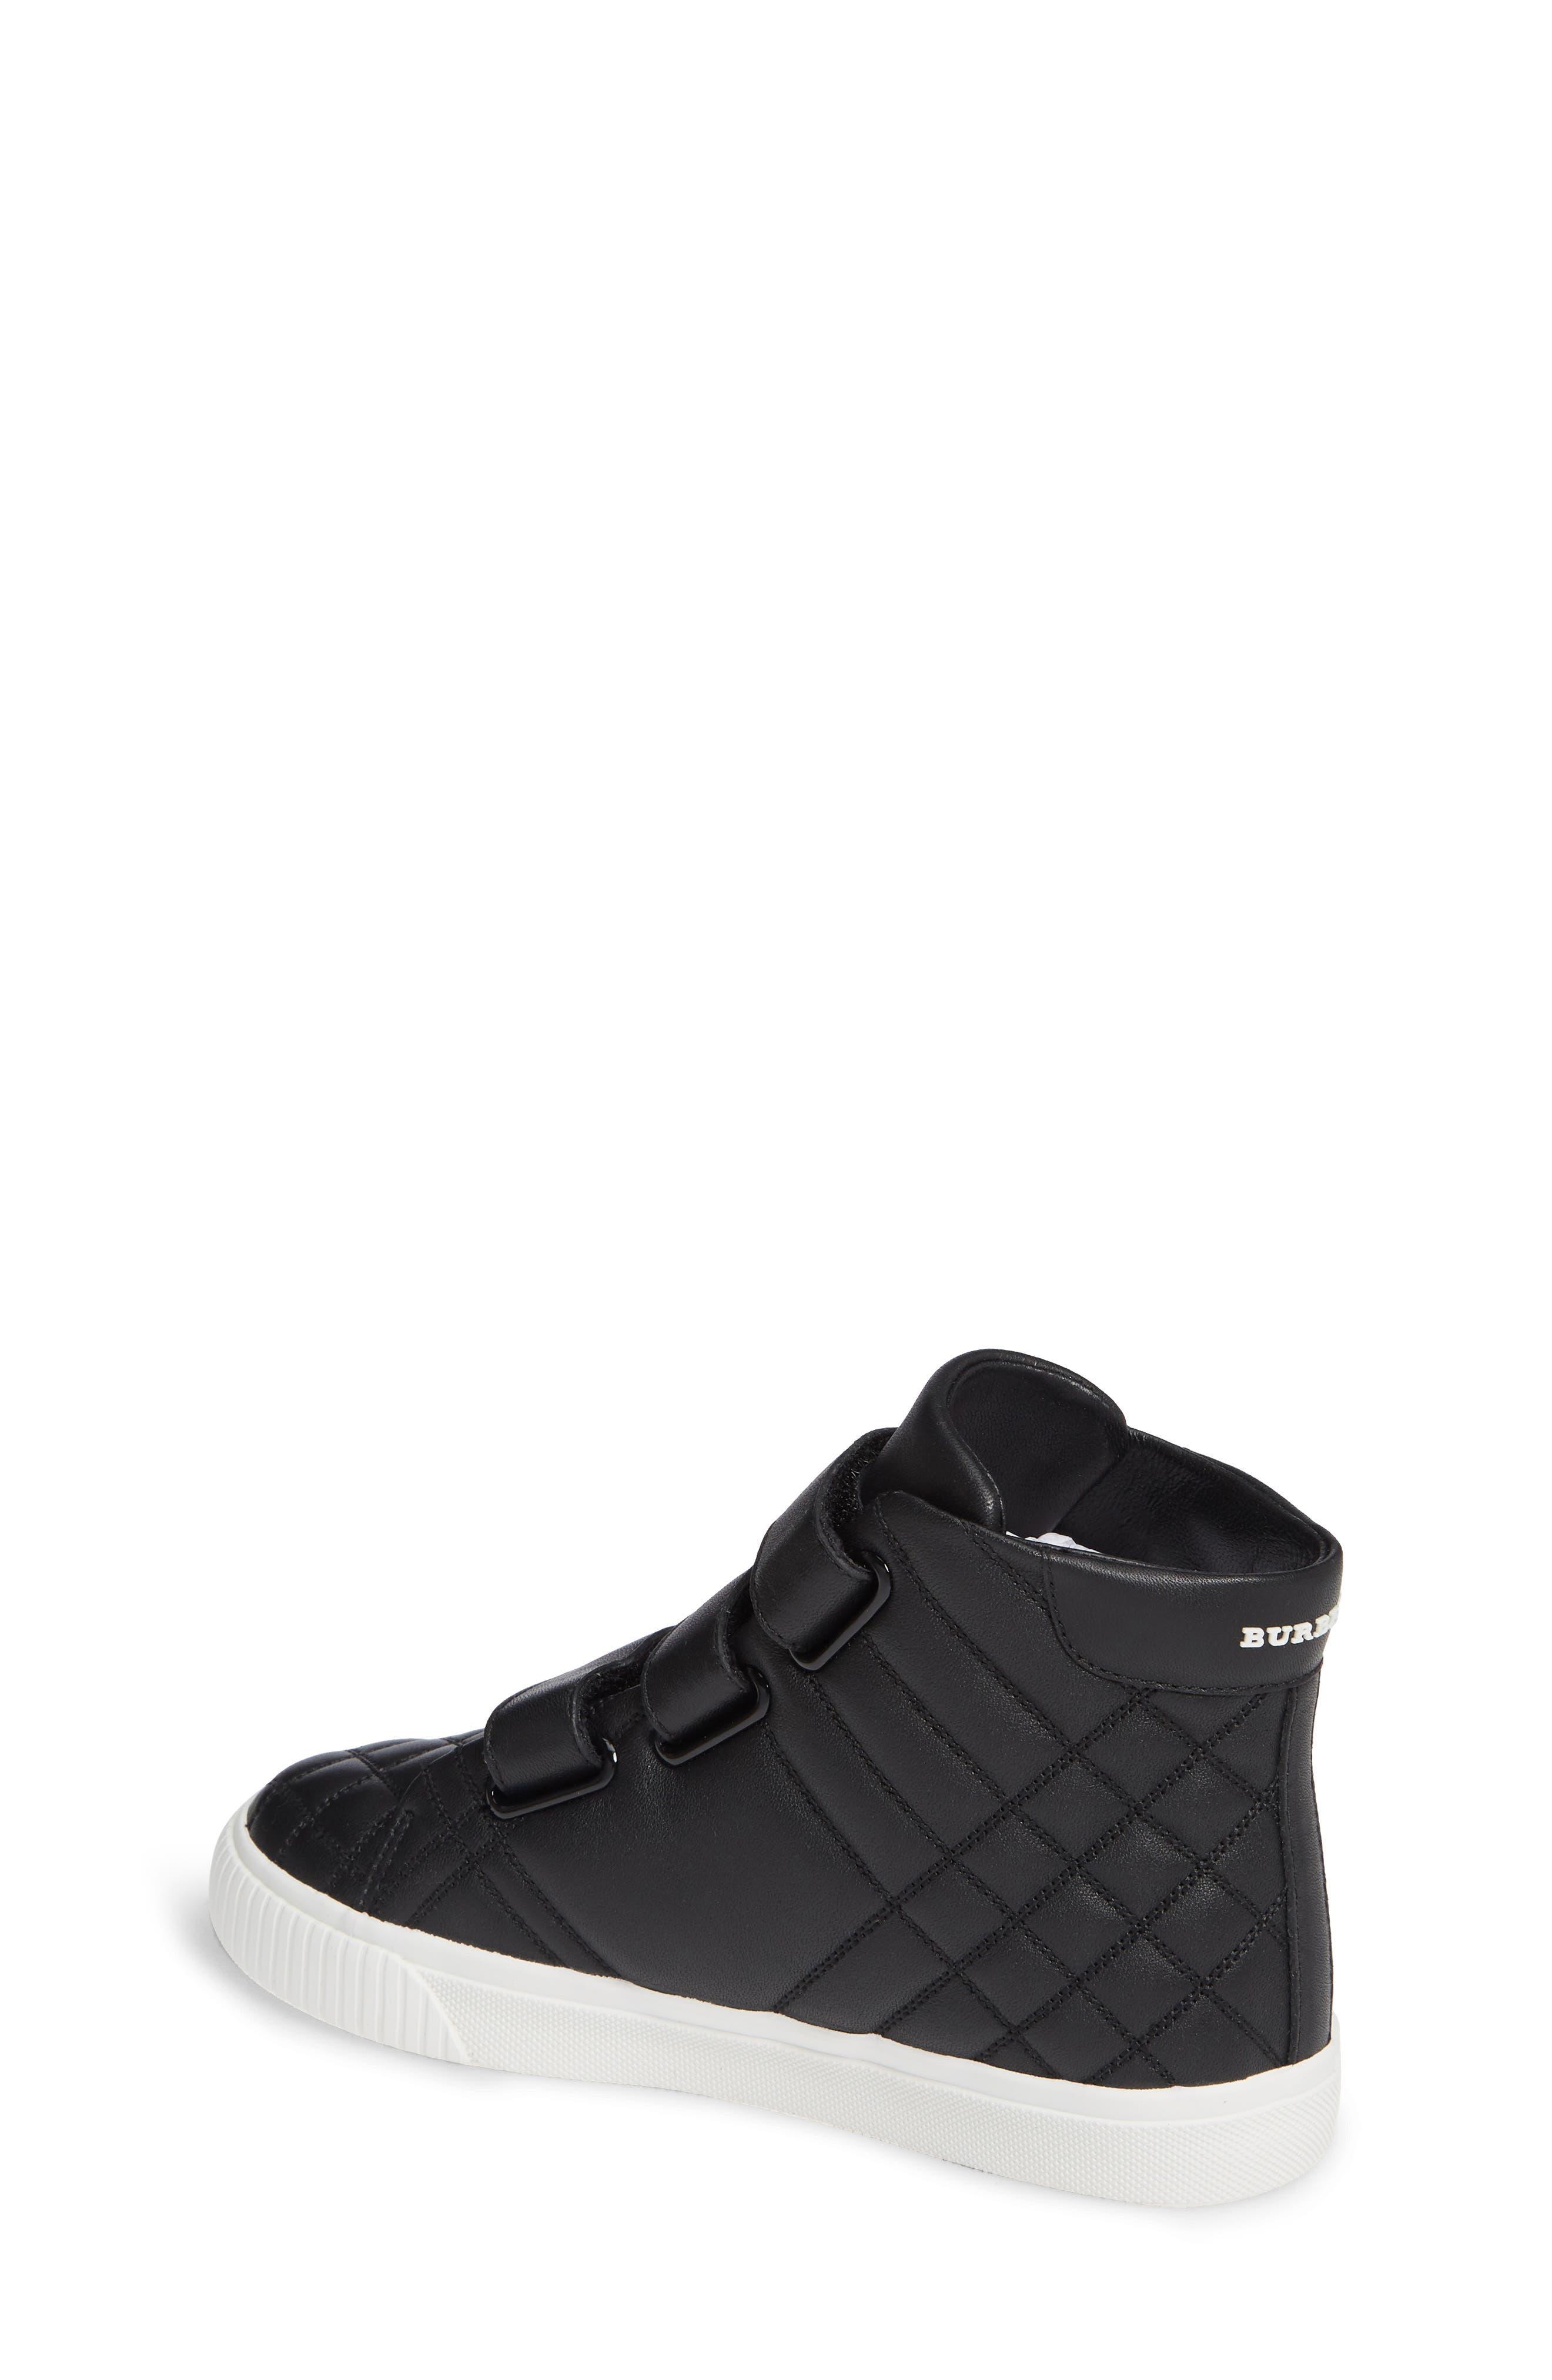 Sturrock Hi Top Sneaker,                             Alternate thumbnail 2, color,                             BLACK